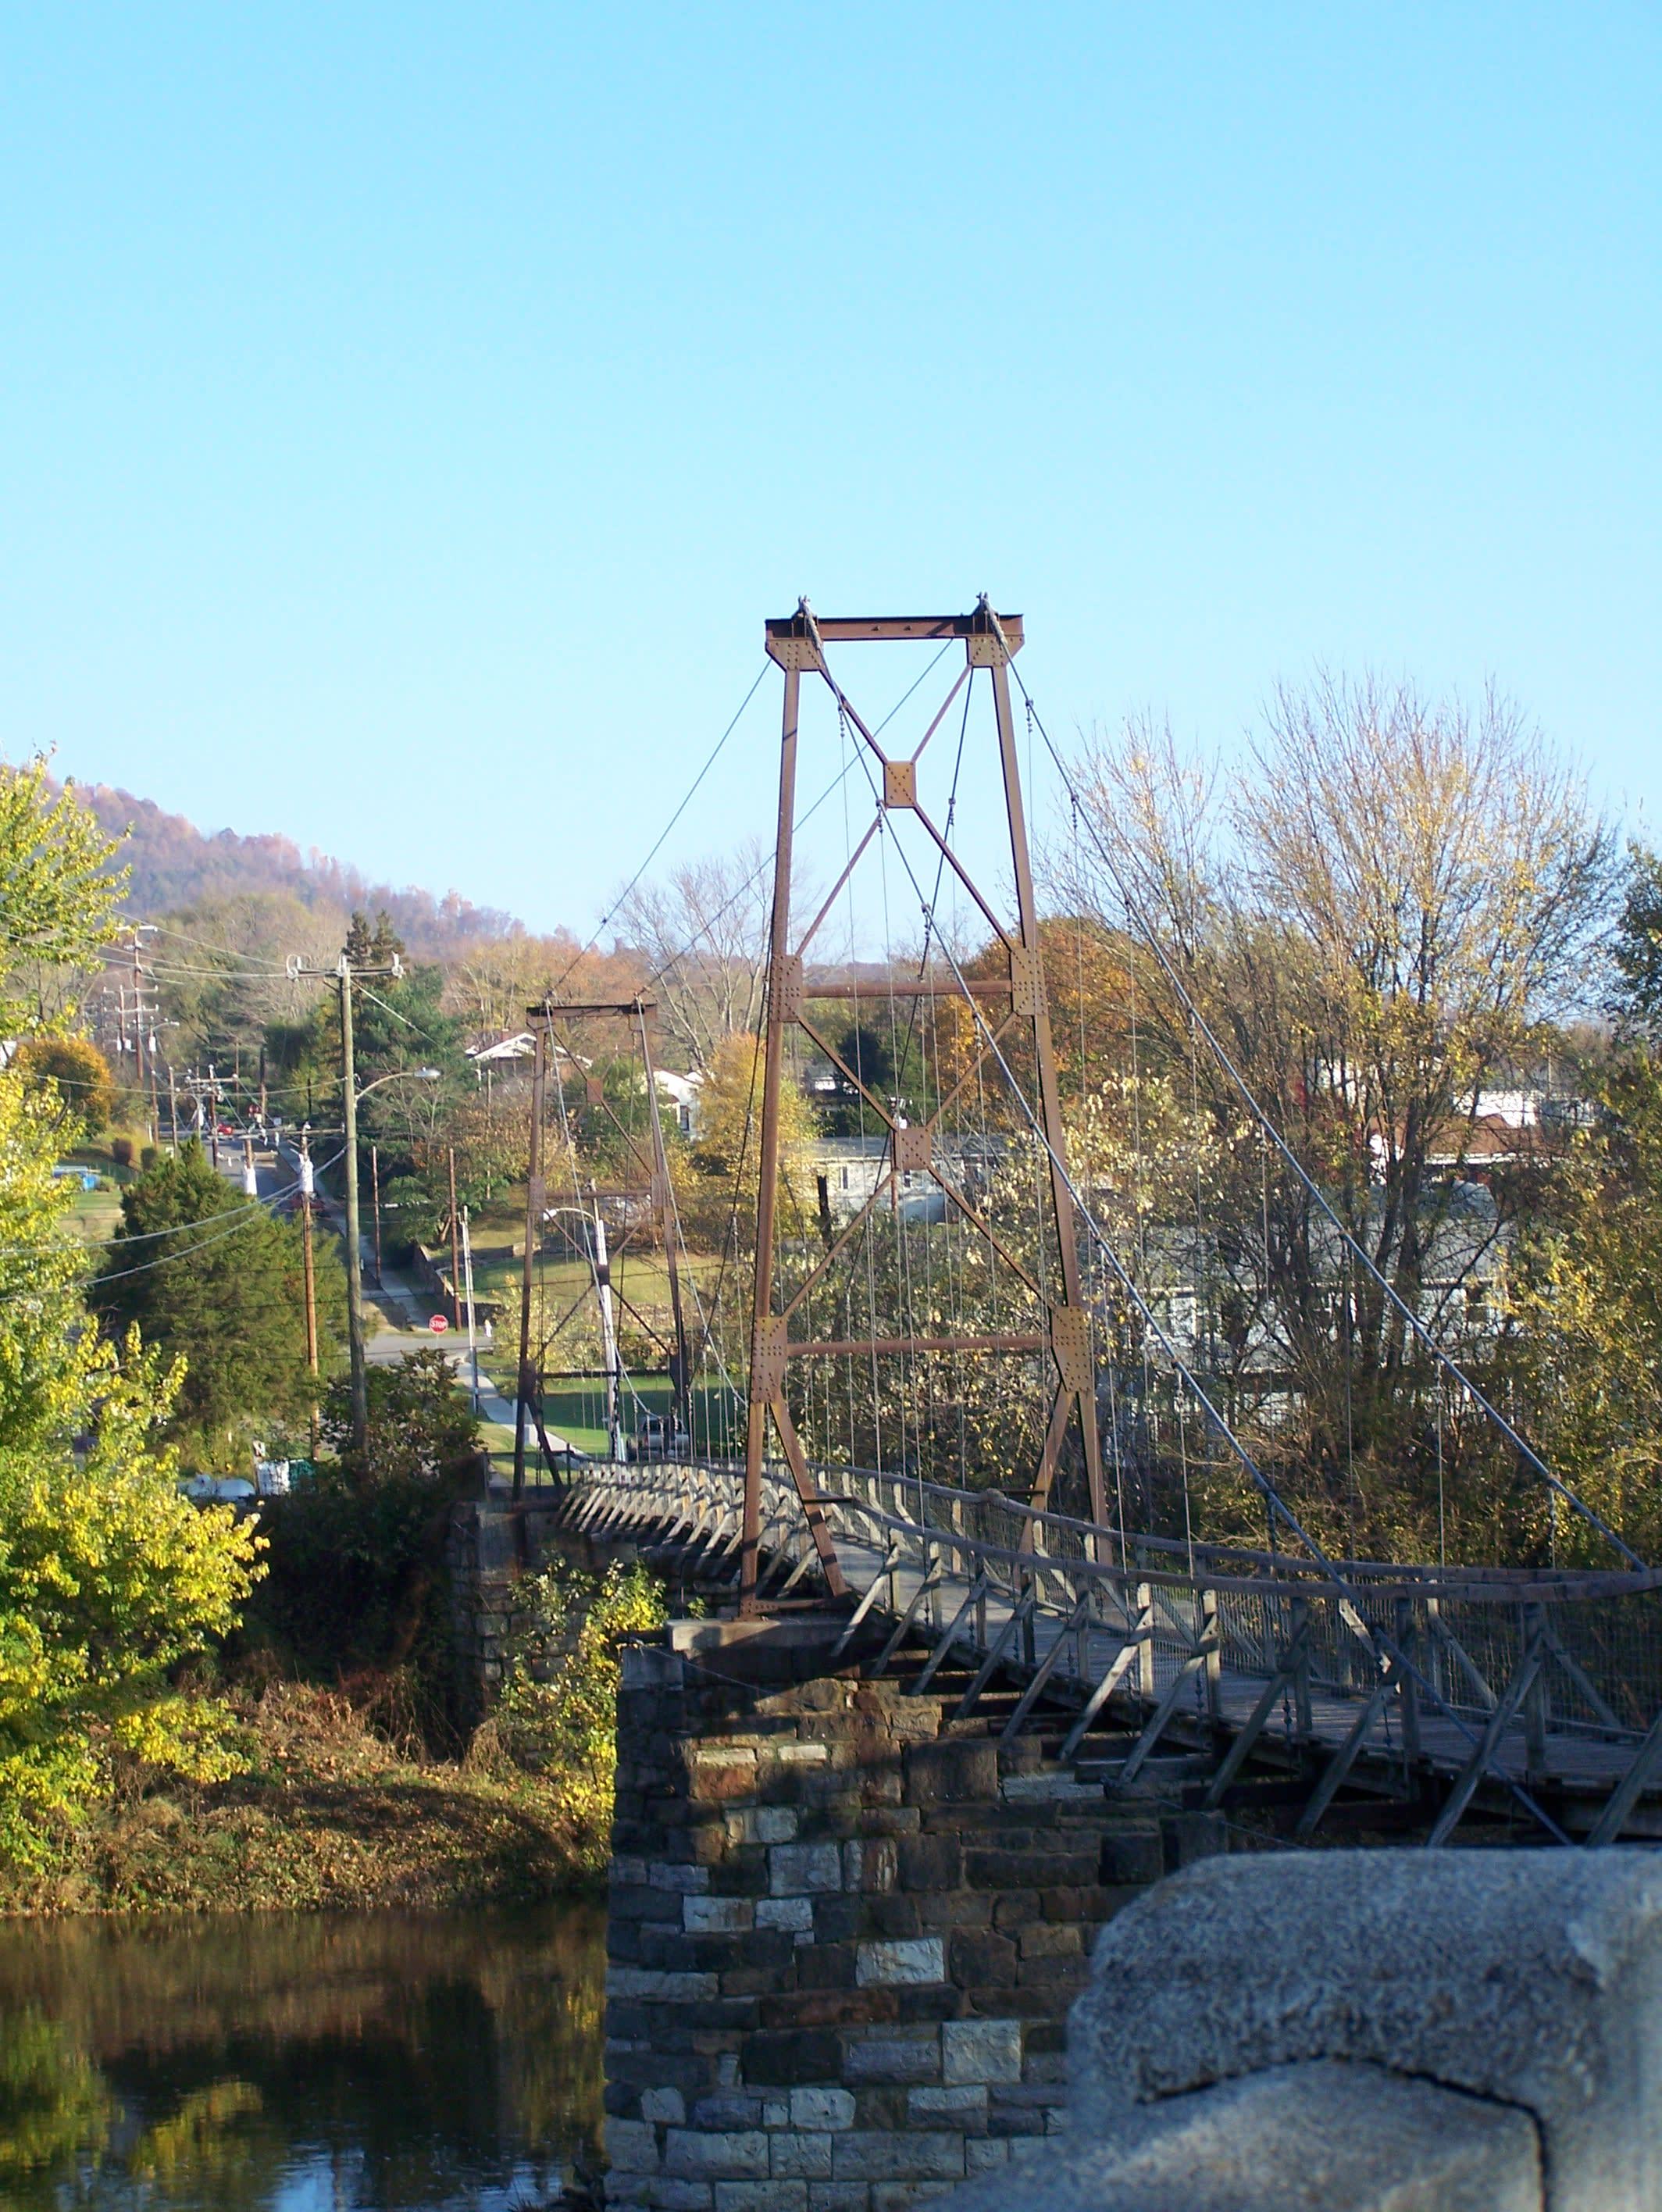 Town of Buchanan   Buchanan, VA 24066